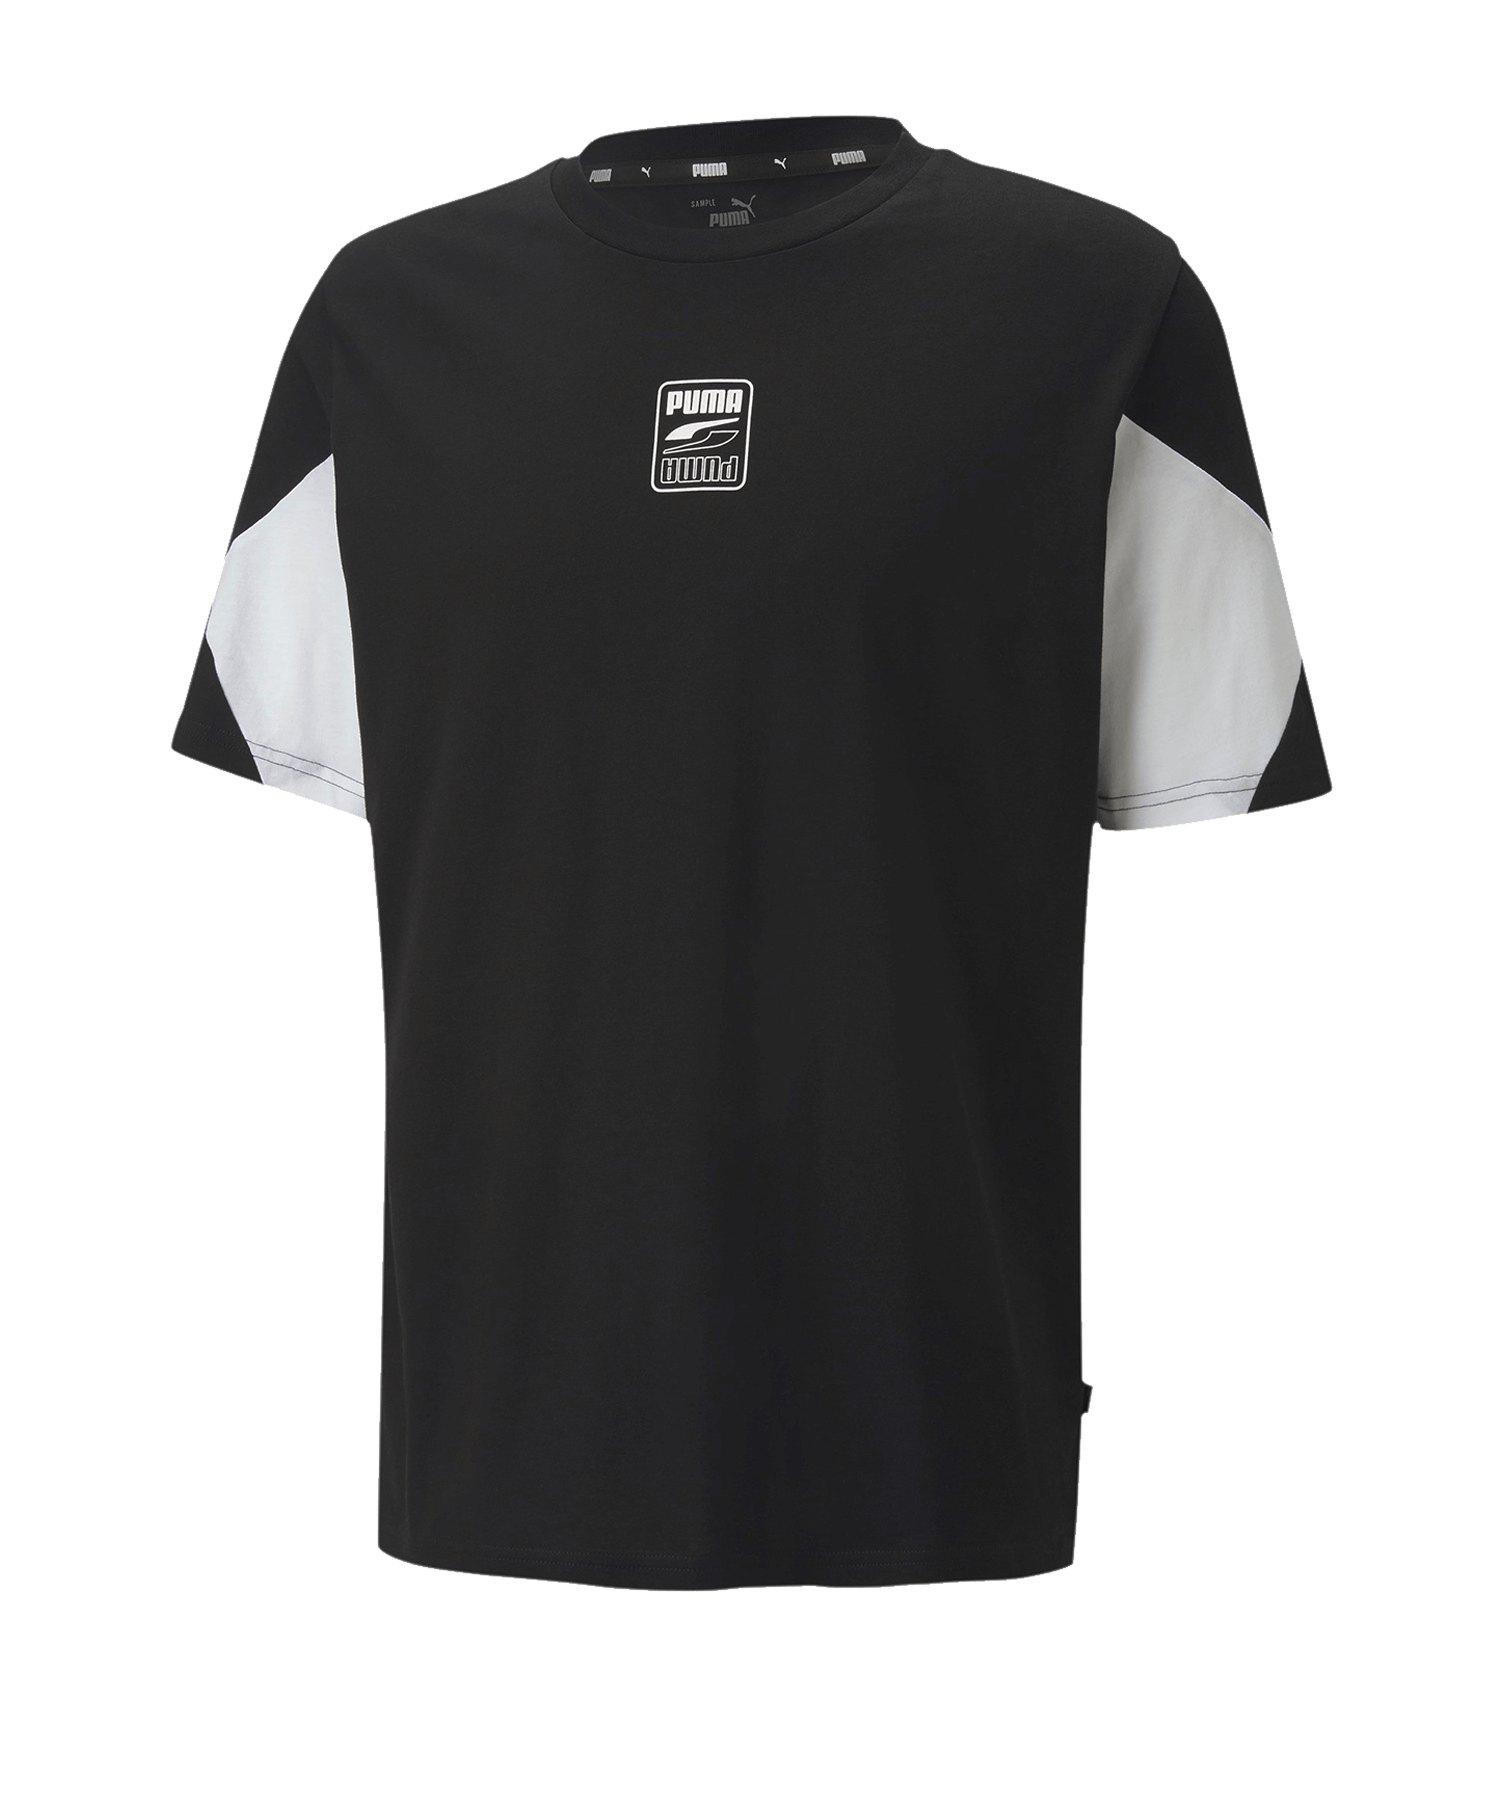 PUMA Rebel Advanced Tee T-Shirt Schwarz F01 - schwarz